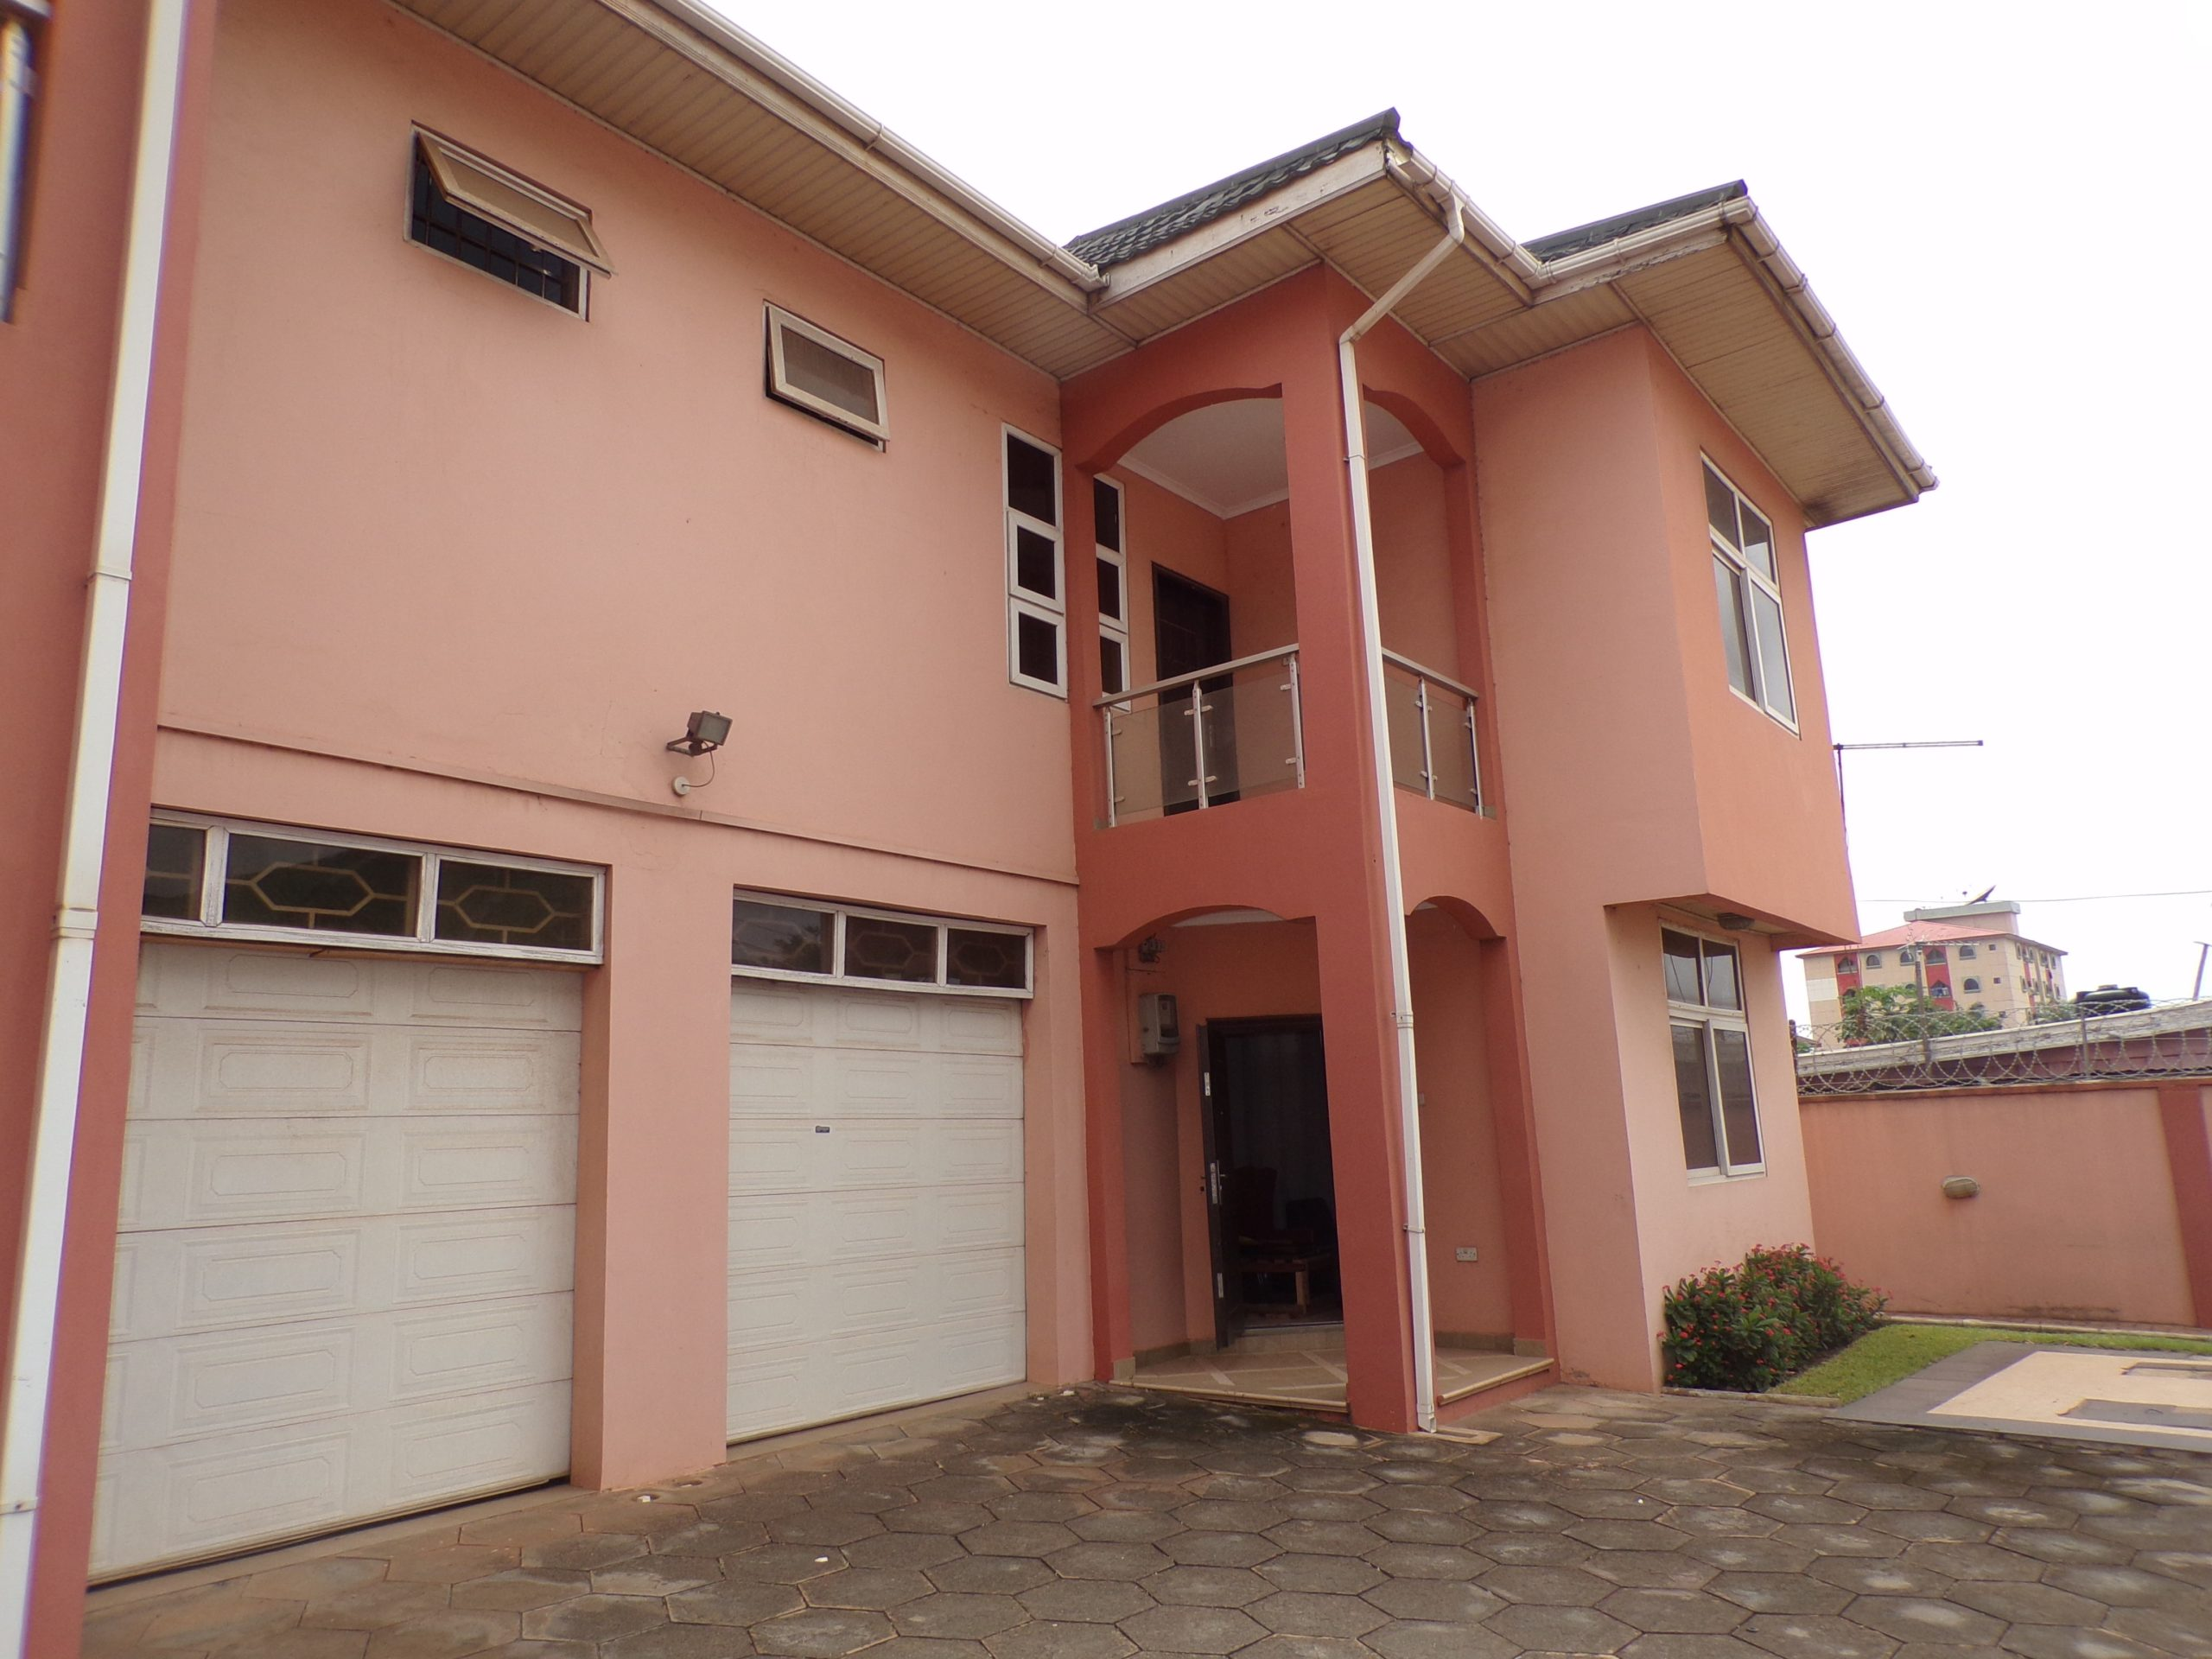 3 bedroom Furnished House for Rent at Dzorwulu